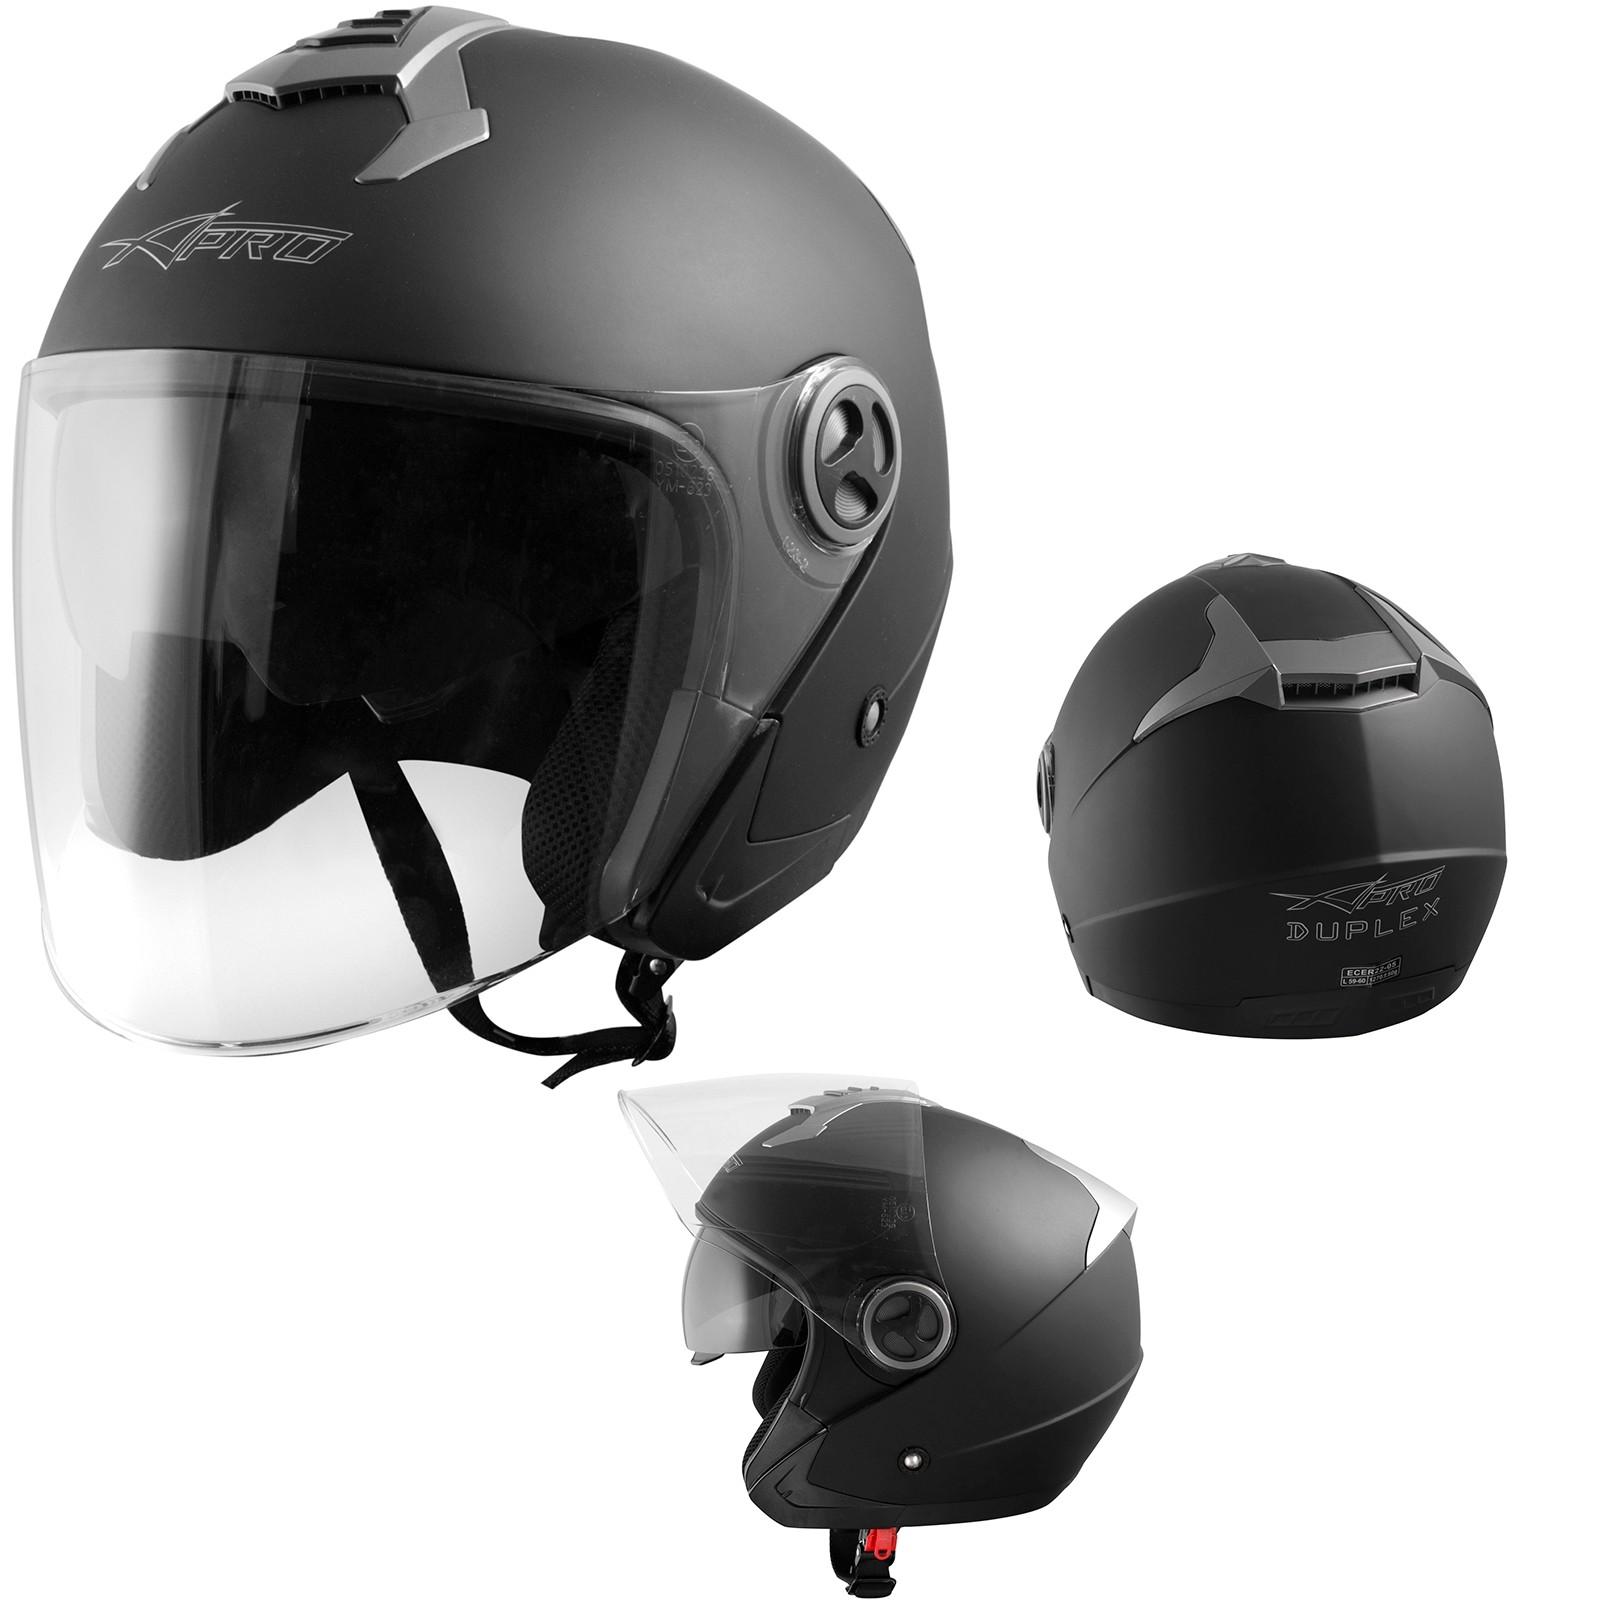 Duplex-Helmet-Casco-Motorcycle-Nero-Opaco-Matt-Black-Sonic-Moto-A-Pro-Set